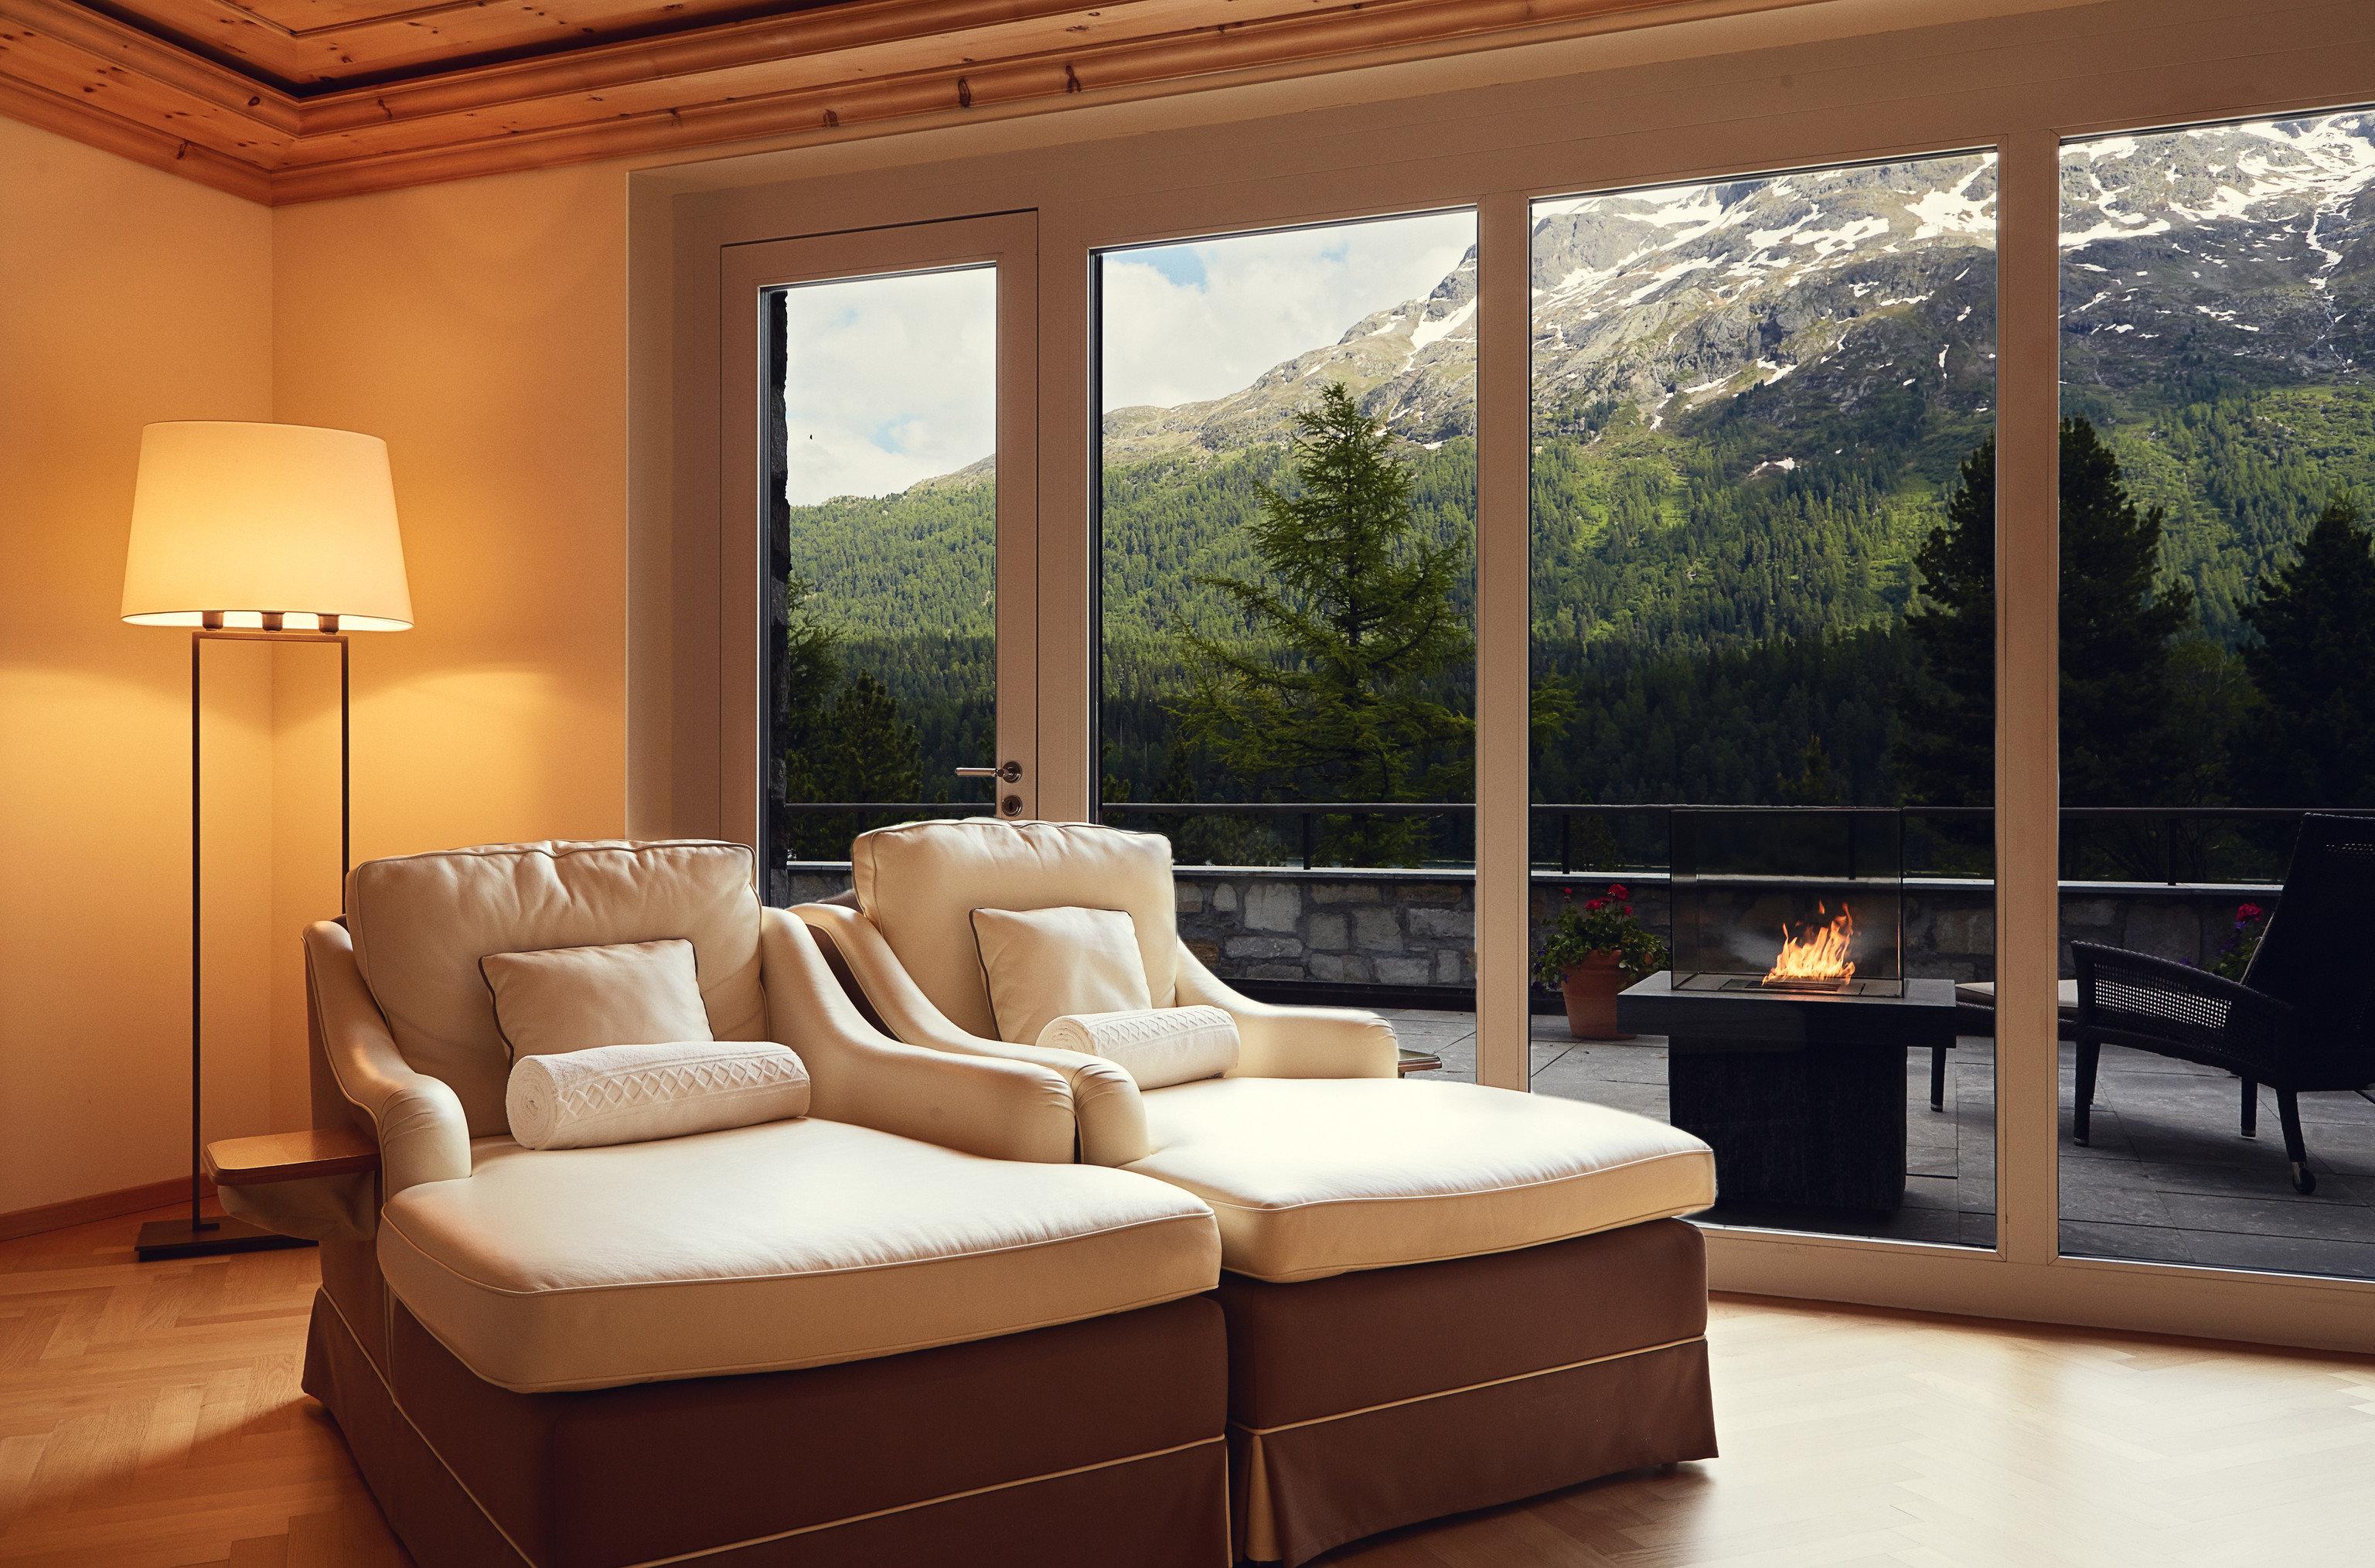 property living room home hardwood cottage Villa nice Bedroom overlooking